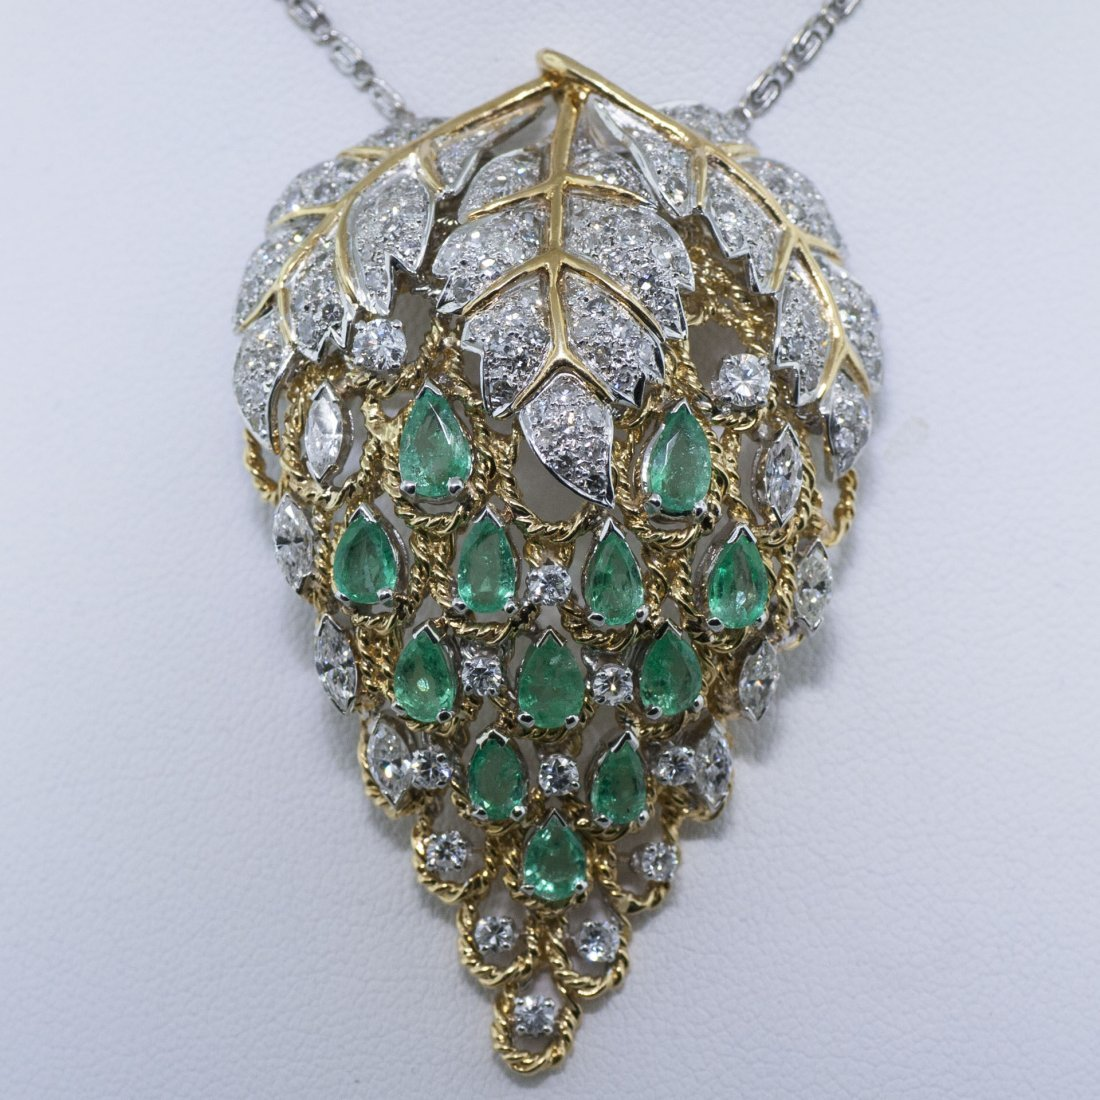 Estate 18kt Gold Emerald & Diamond Brooch GAL Certified